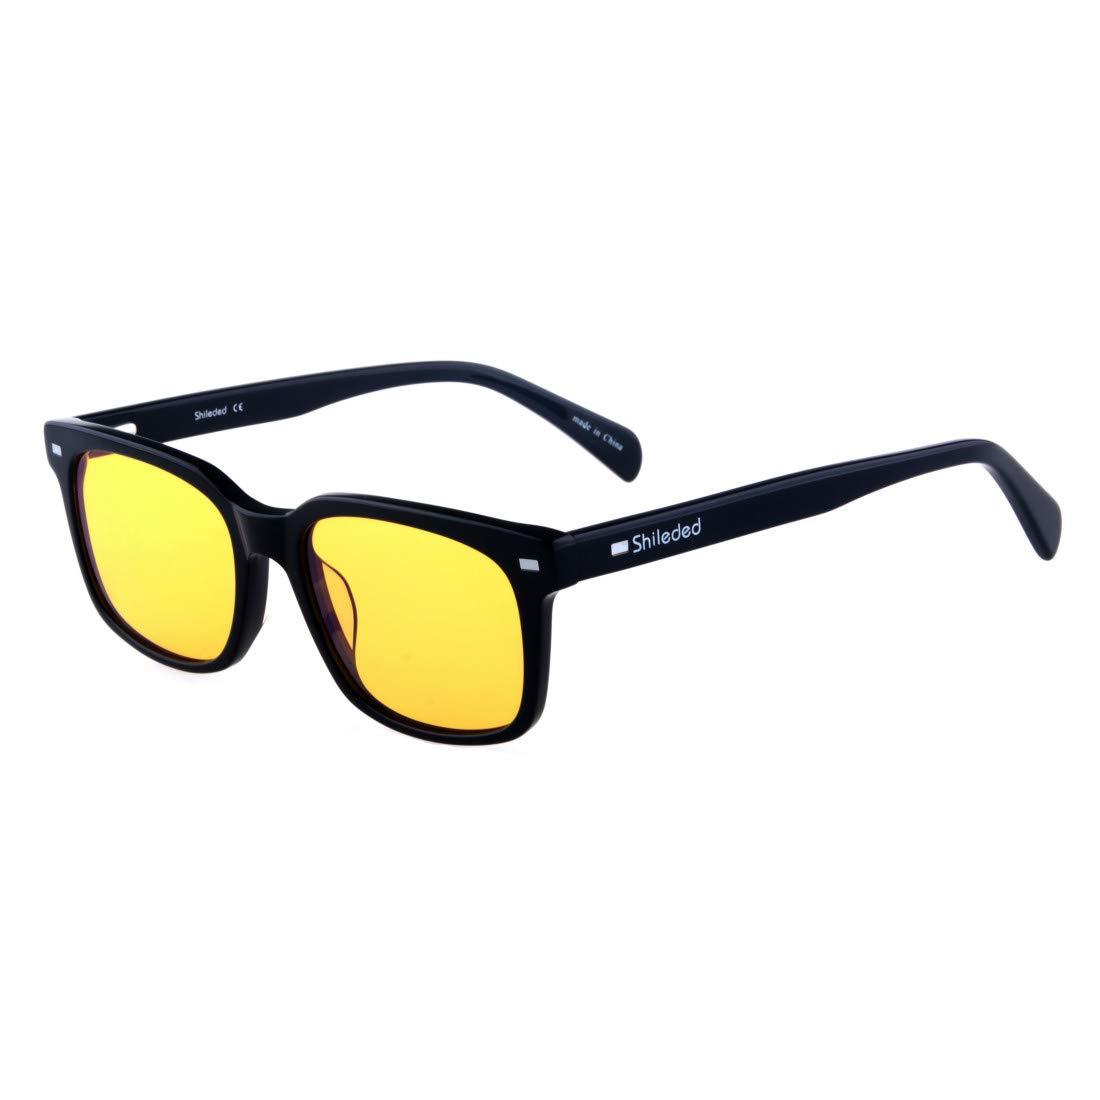 d2fa2831a705e Amazon.com  Shileded Computer Blue Light Blocking Glassess Better Sleep   Health   Personal Care